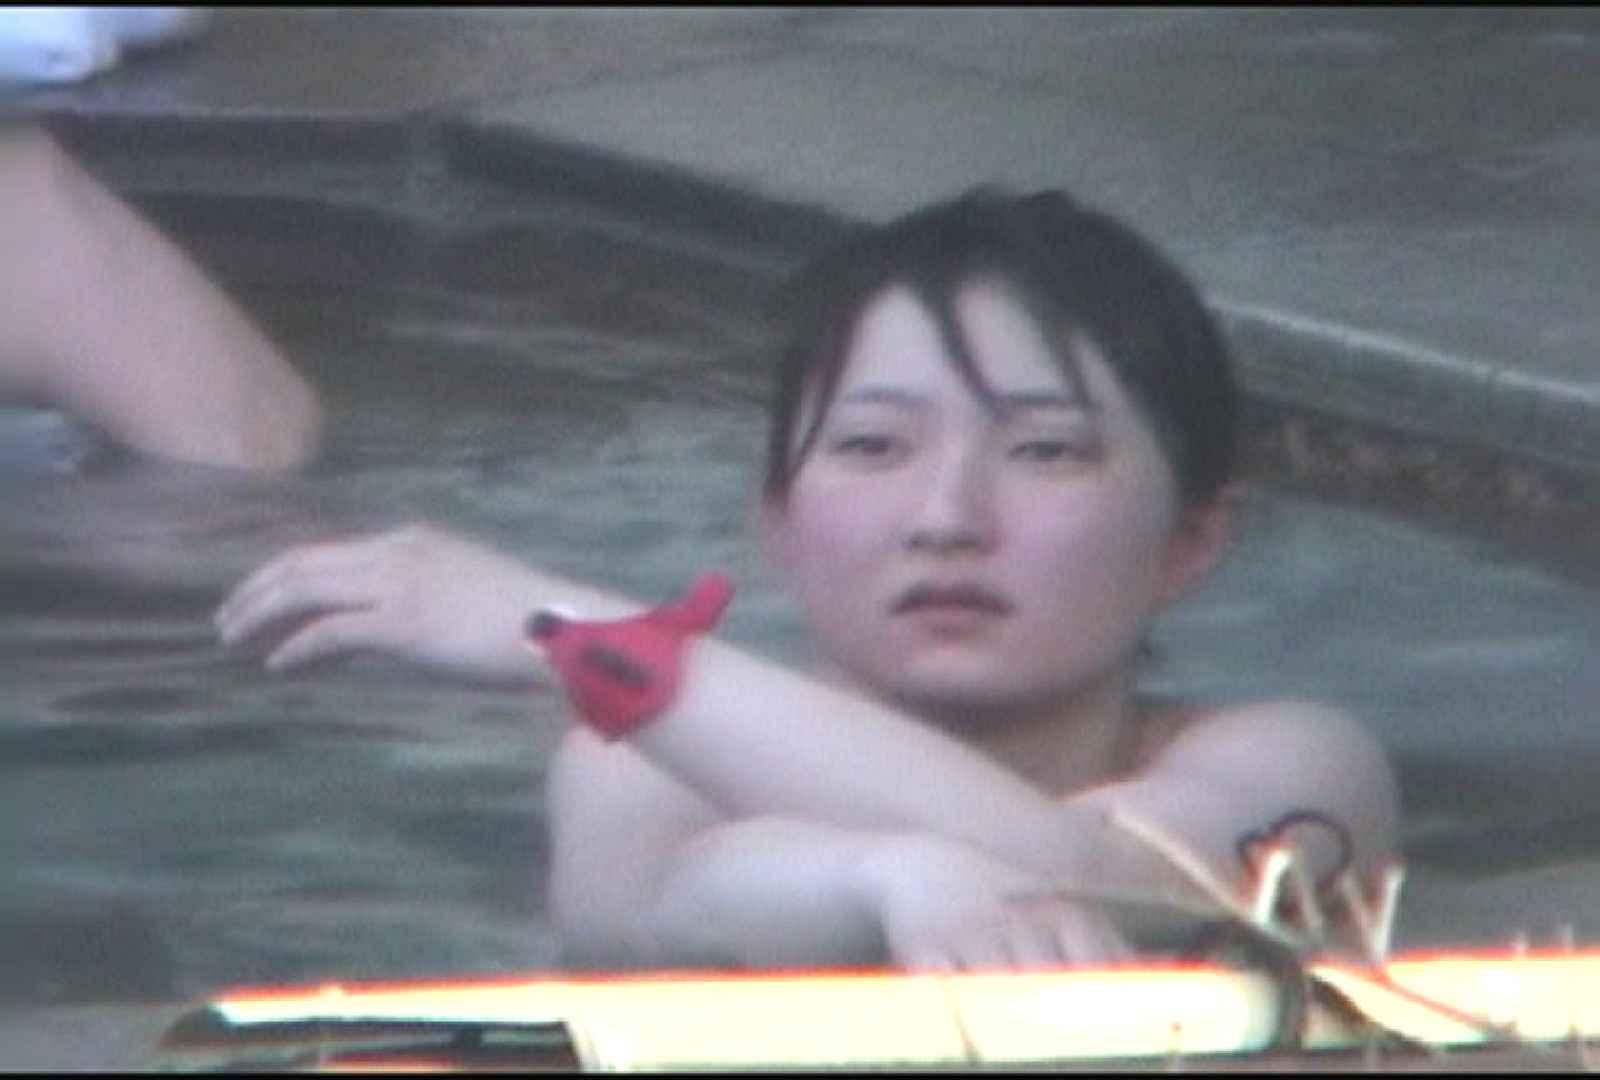 Aquaな露天風呂Vol.176 0 | 0  43連発 43